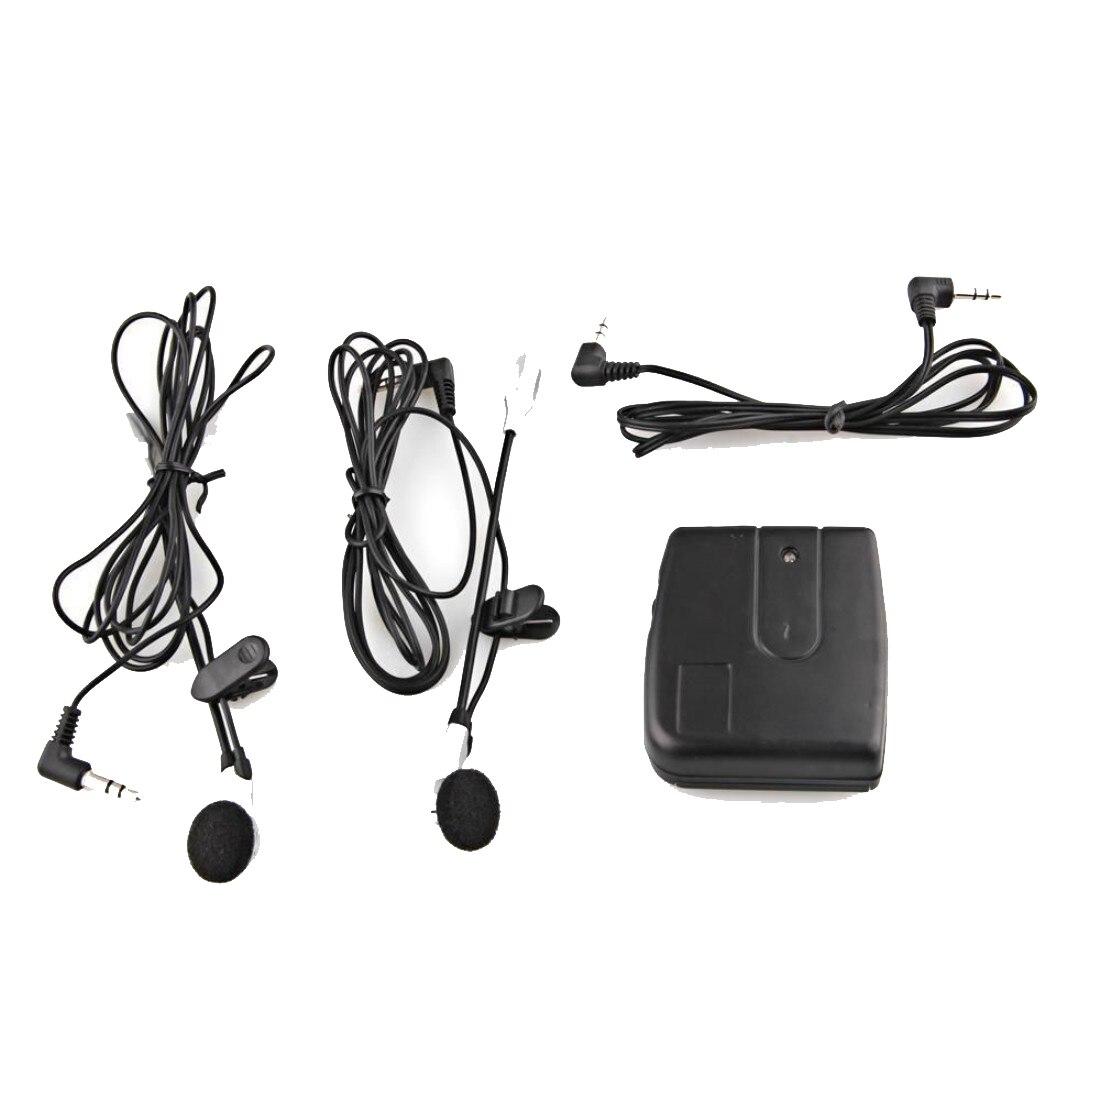 Dewtreetali Sports Motorbike Helmet 2-Way Intercom Headset Black + Earphone Stereo